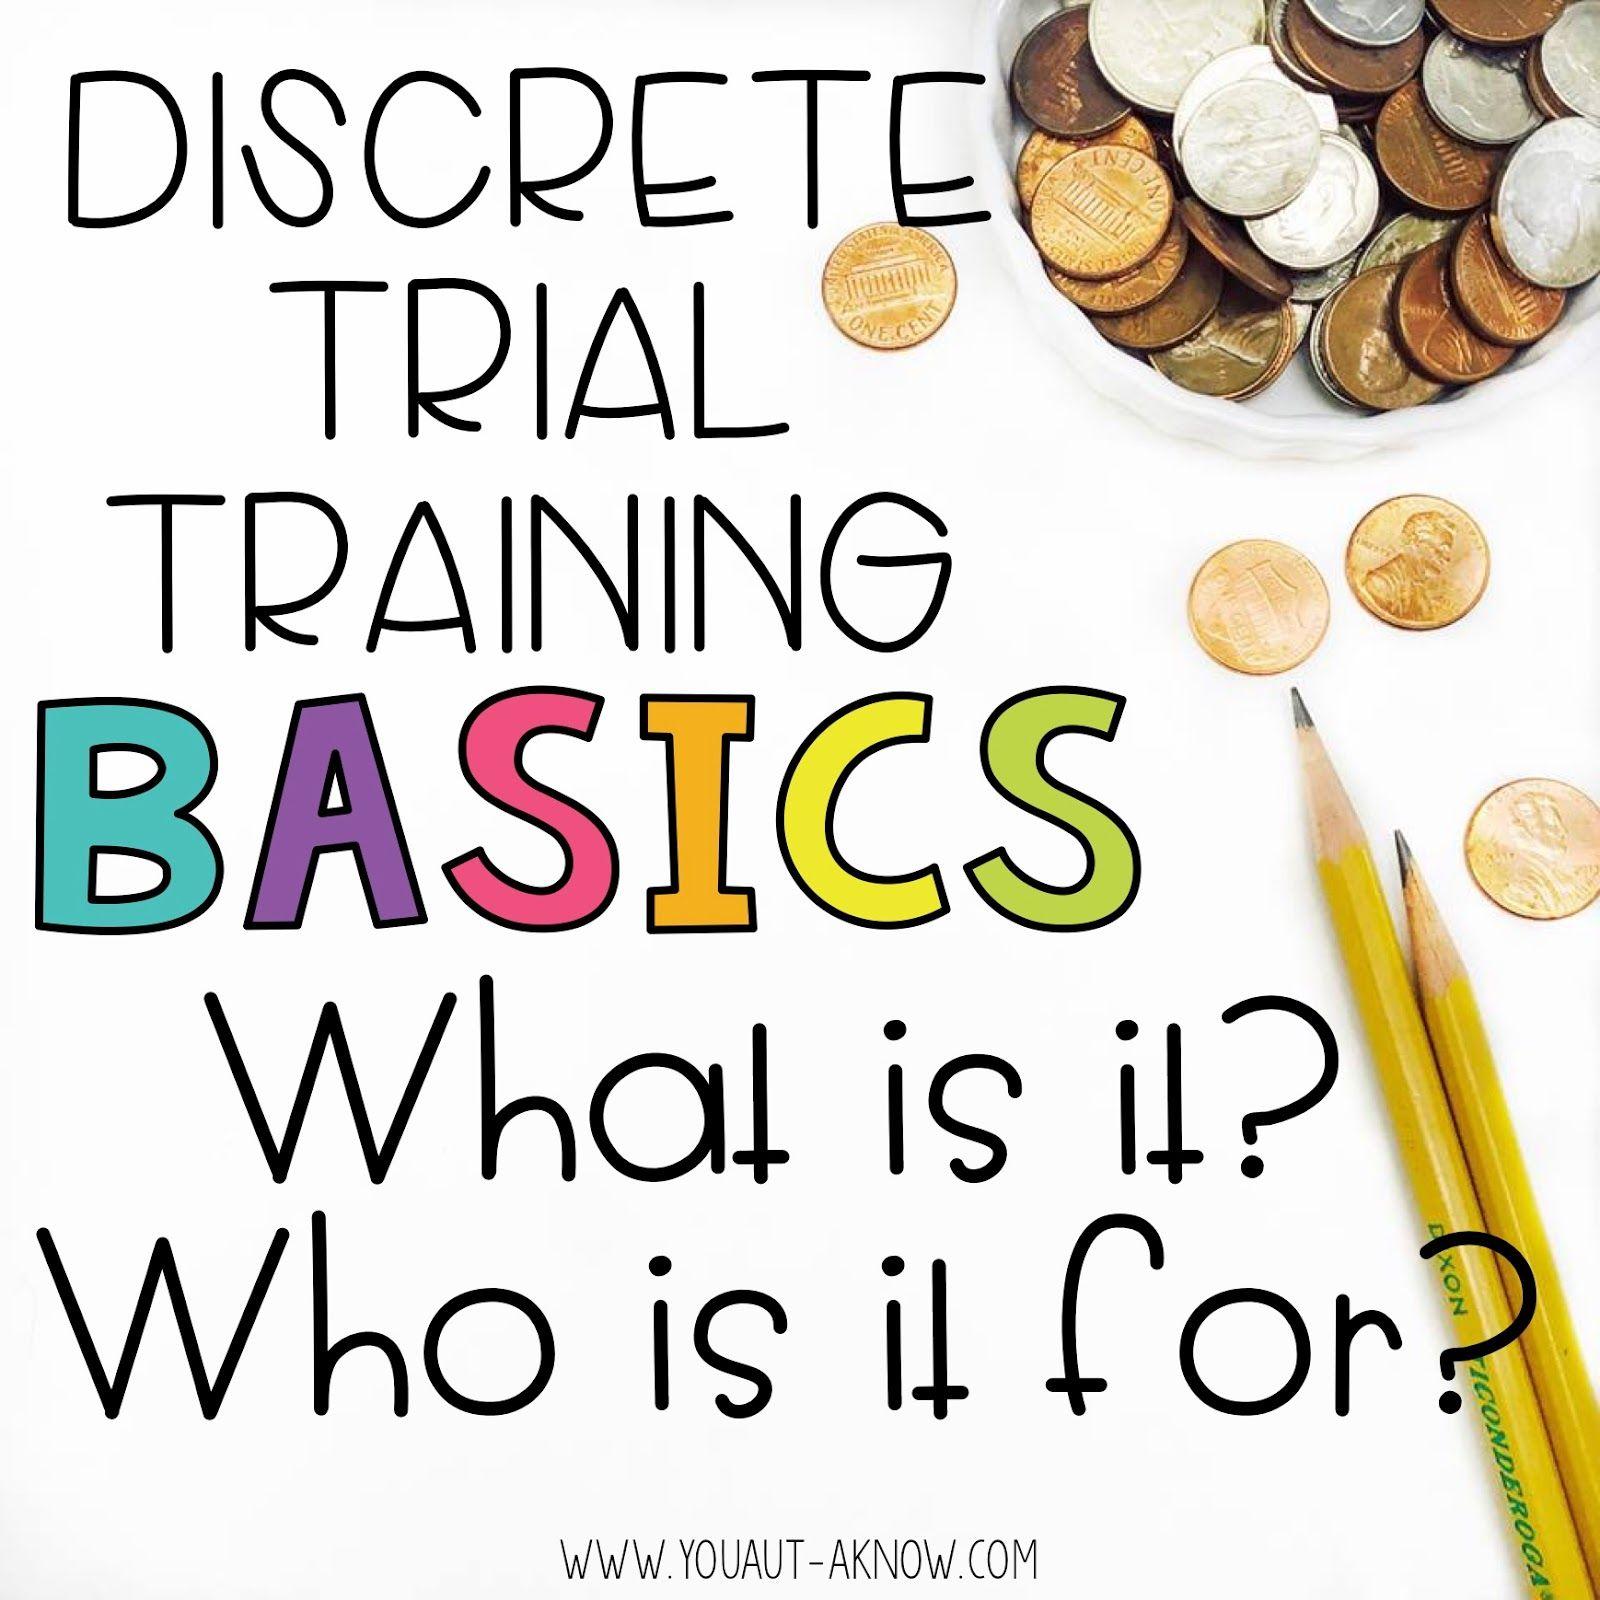 Discrete Trial Basics What Is Discrete Trial Training